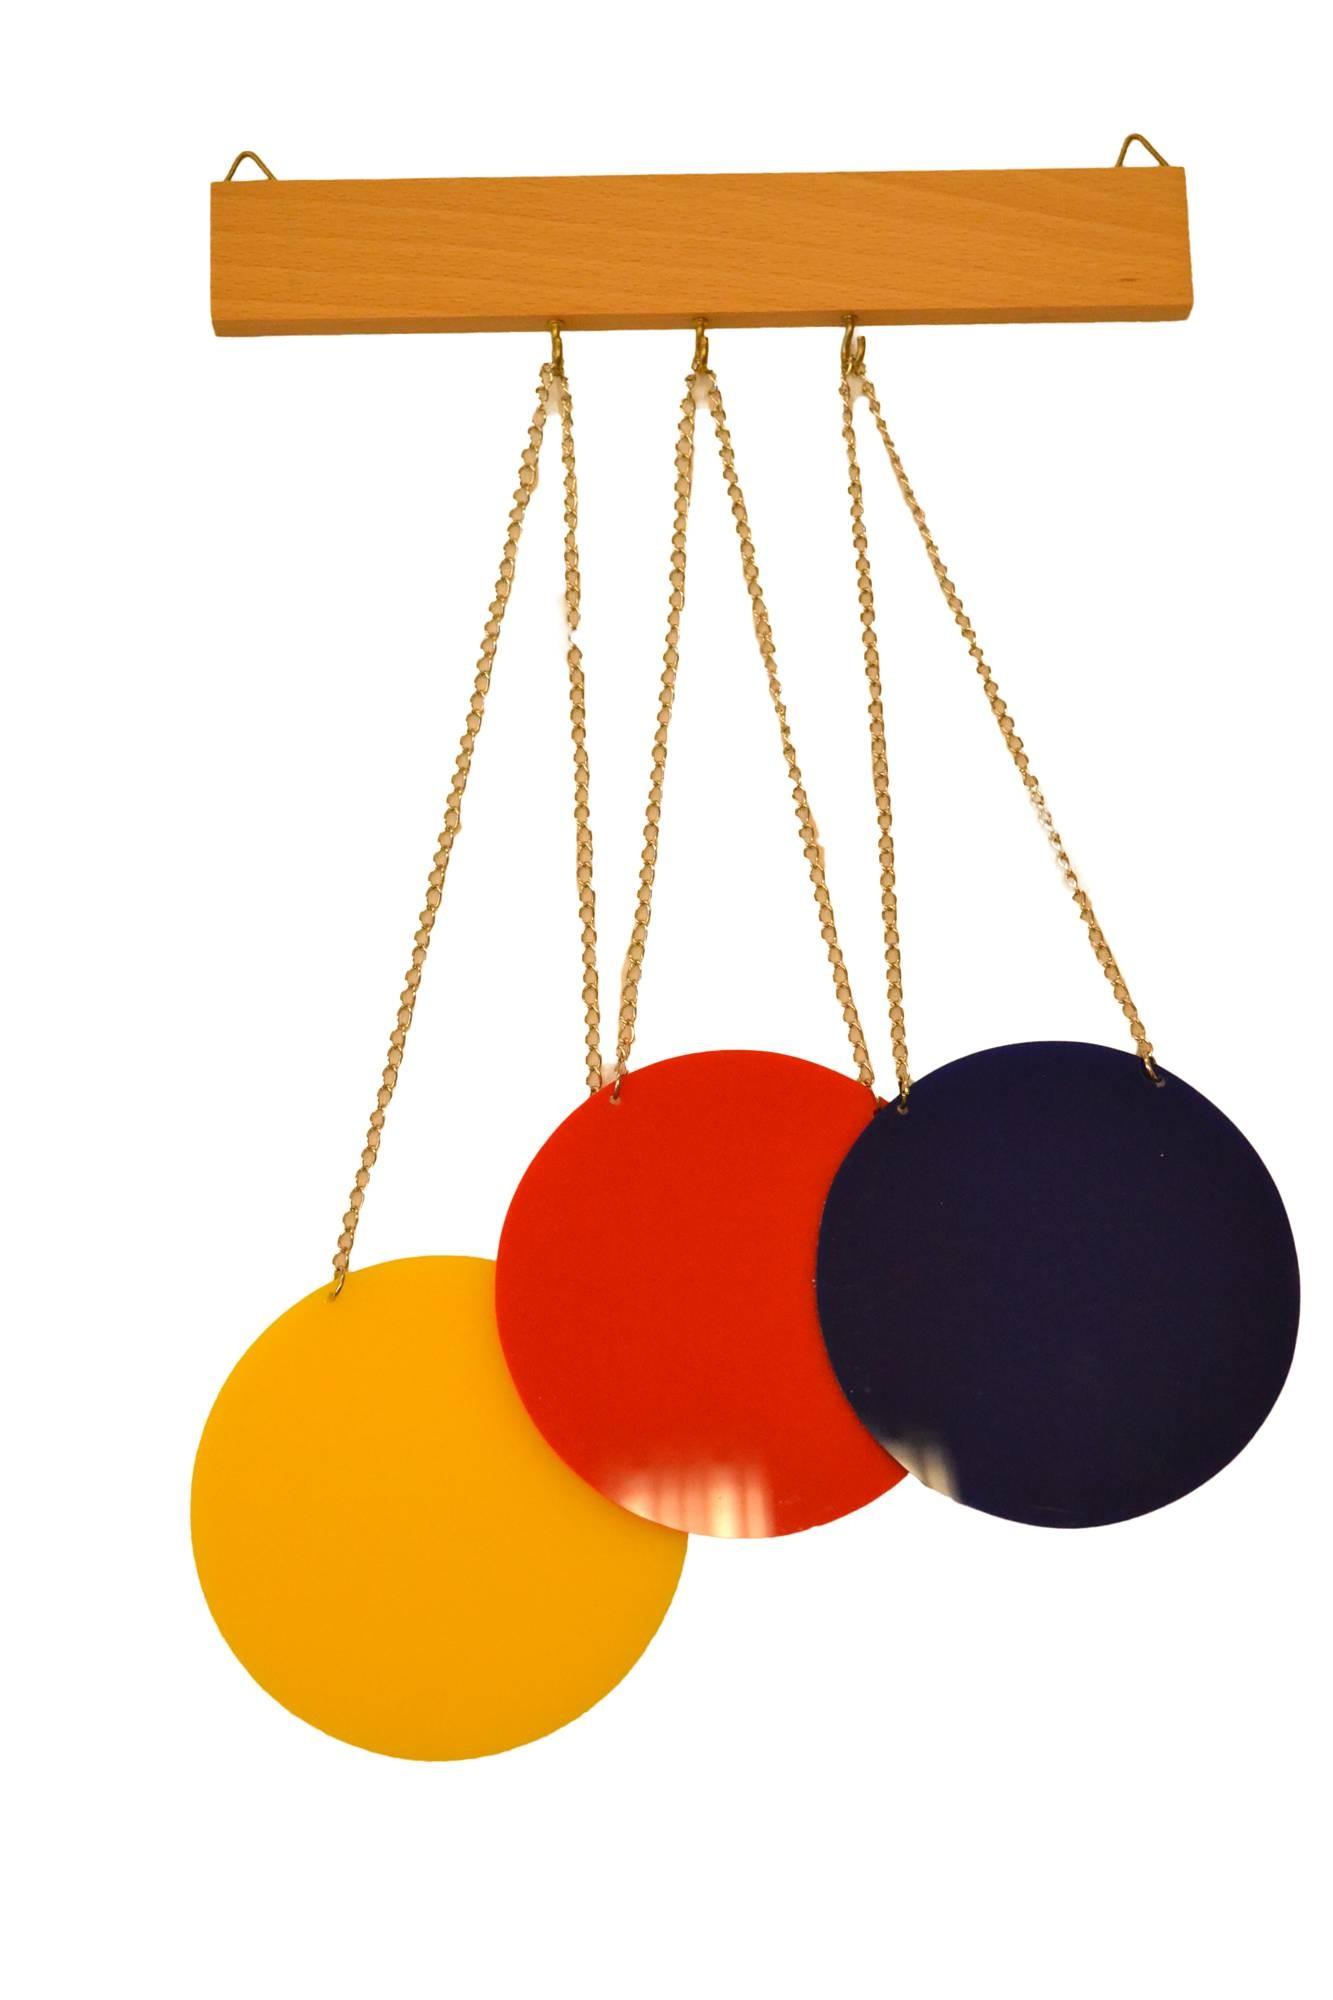 Sada třech barevných disků